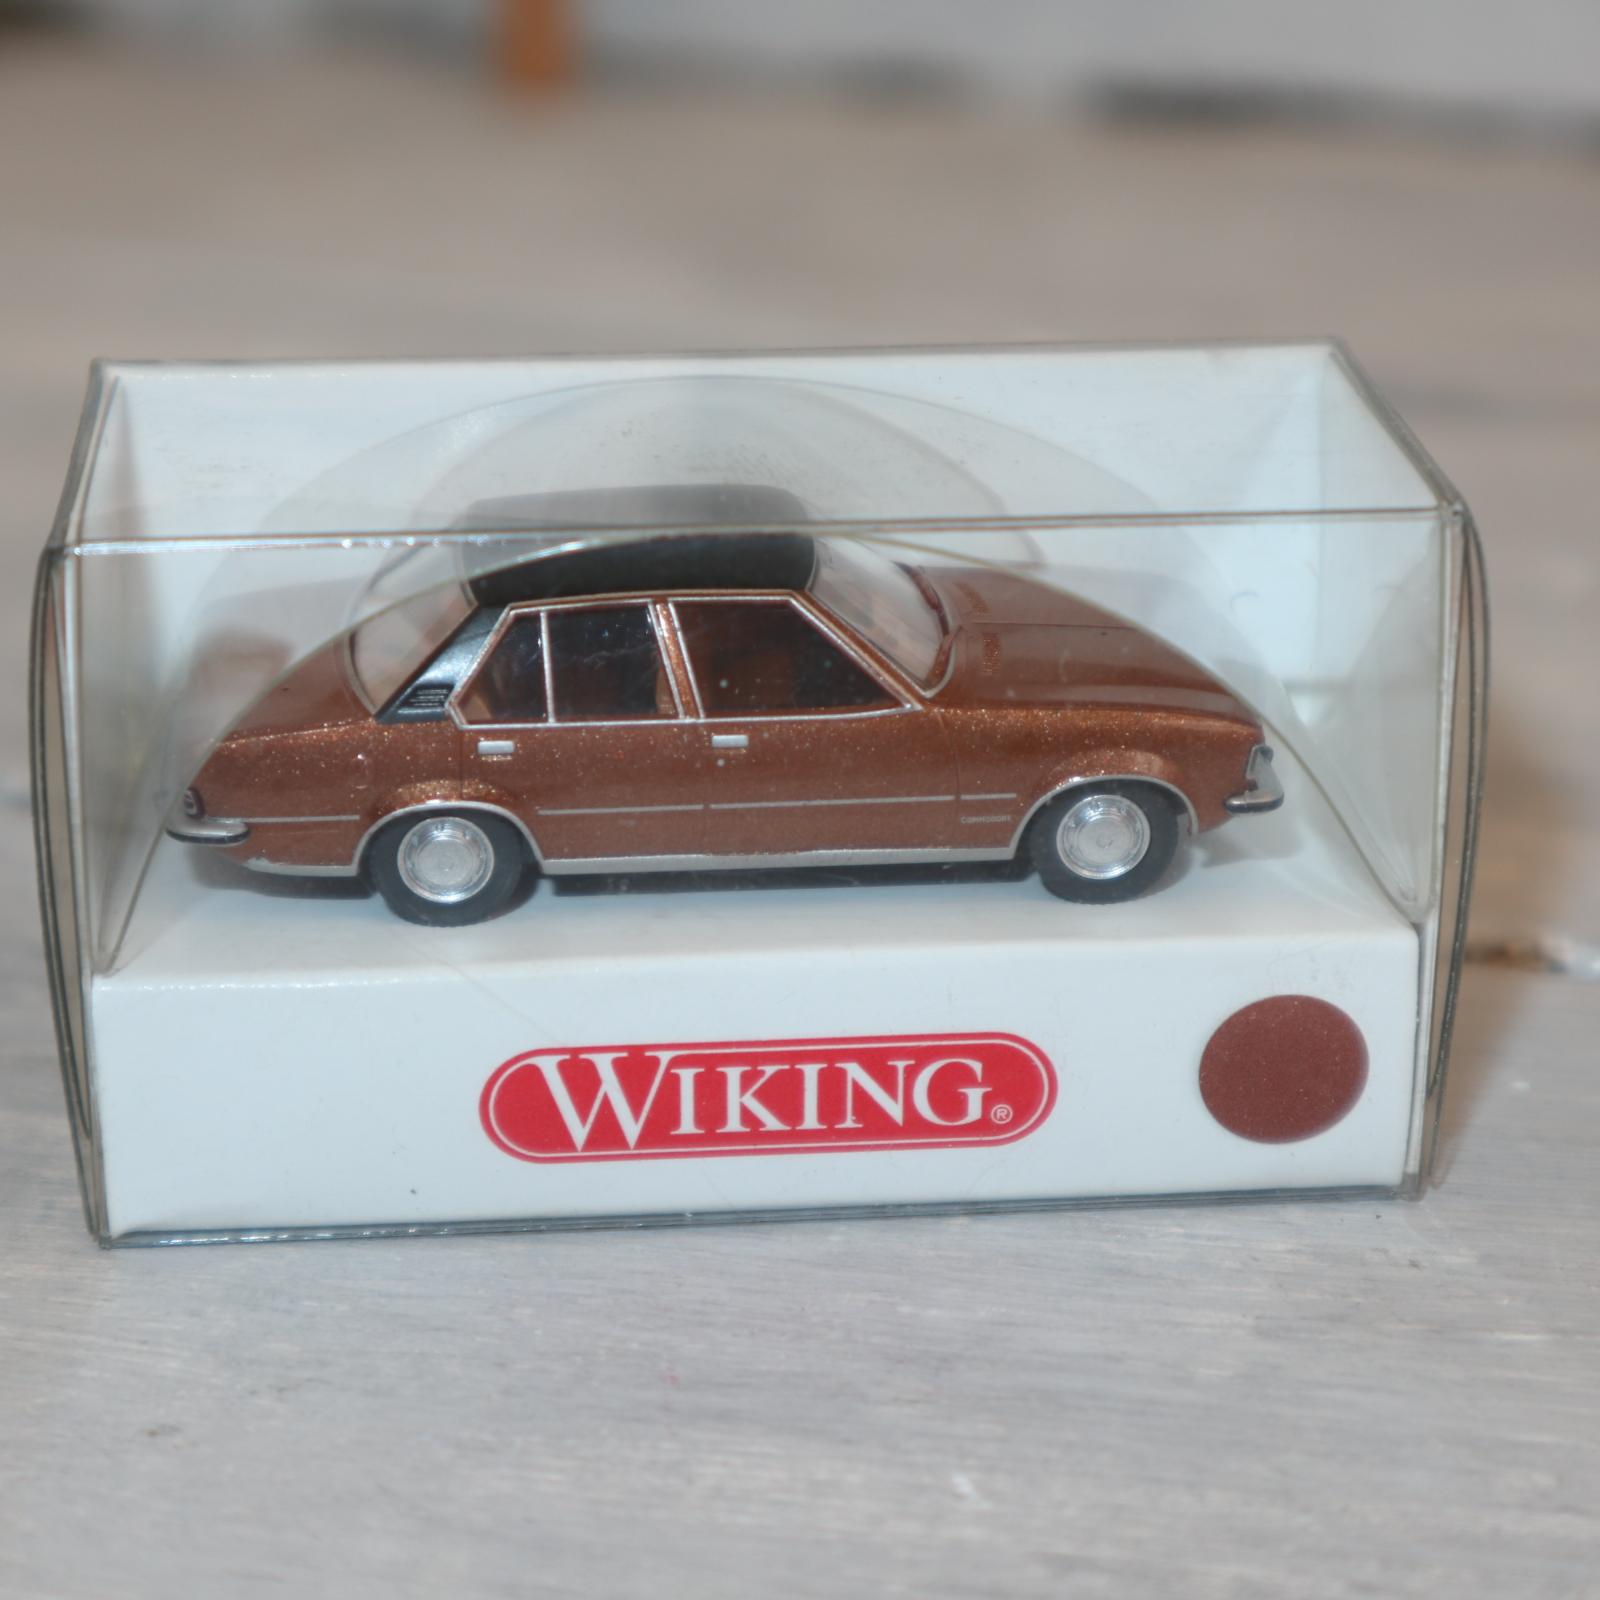 Wiking 07960128 in 1:87 Opel Commodore in goldmetallic mit schwarzem Dach, NEU in OVP